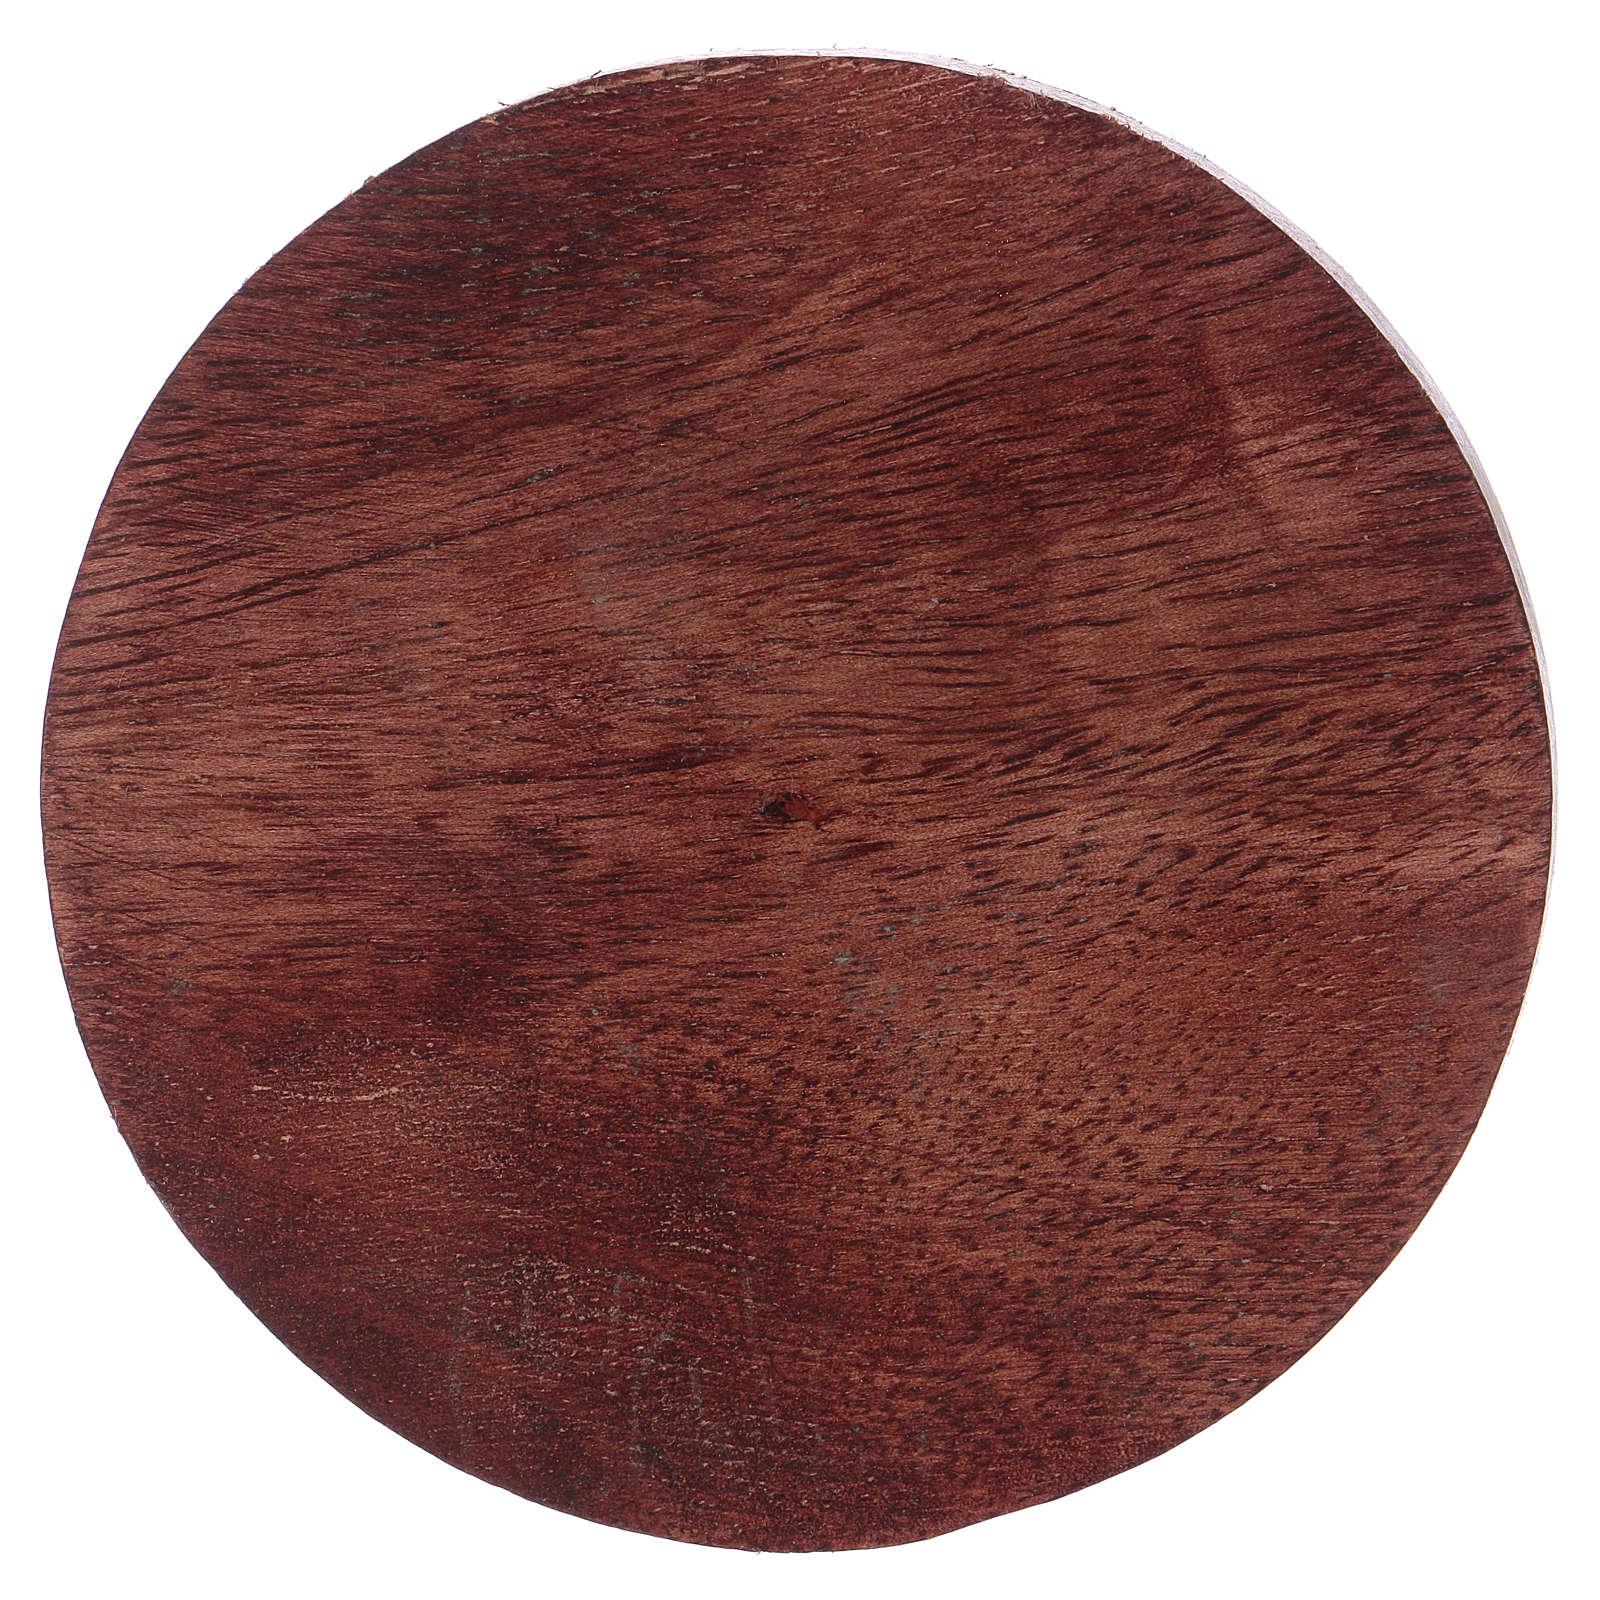 Piattino portacandela legno di mango 10 cm 3